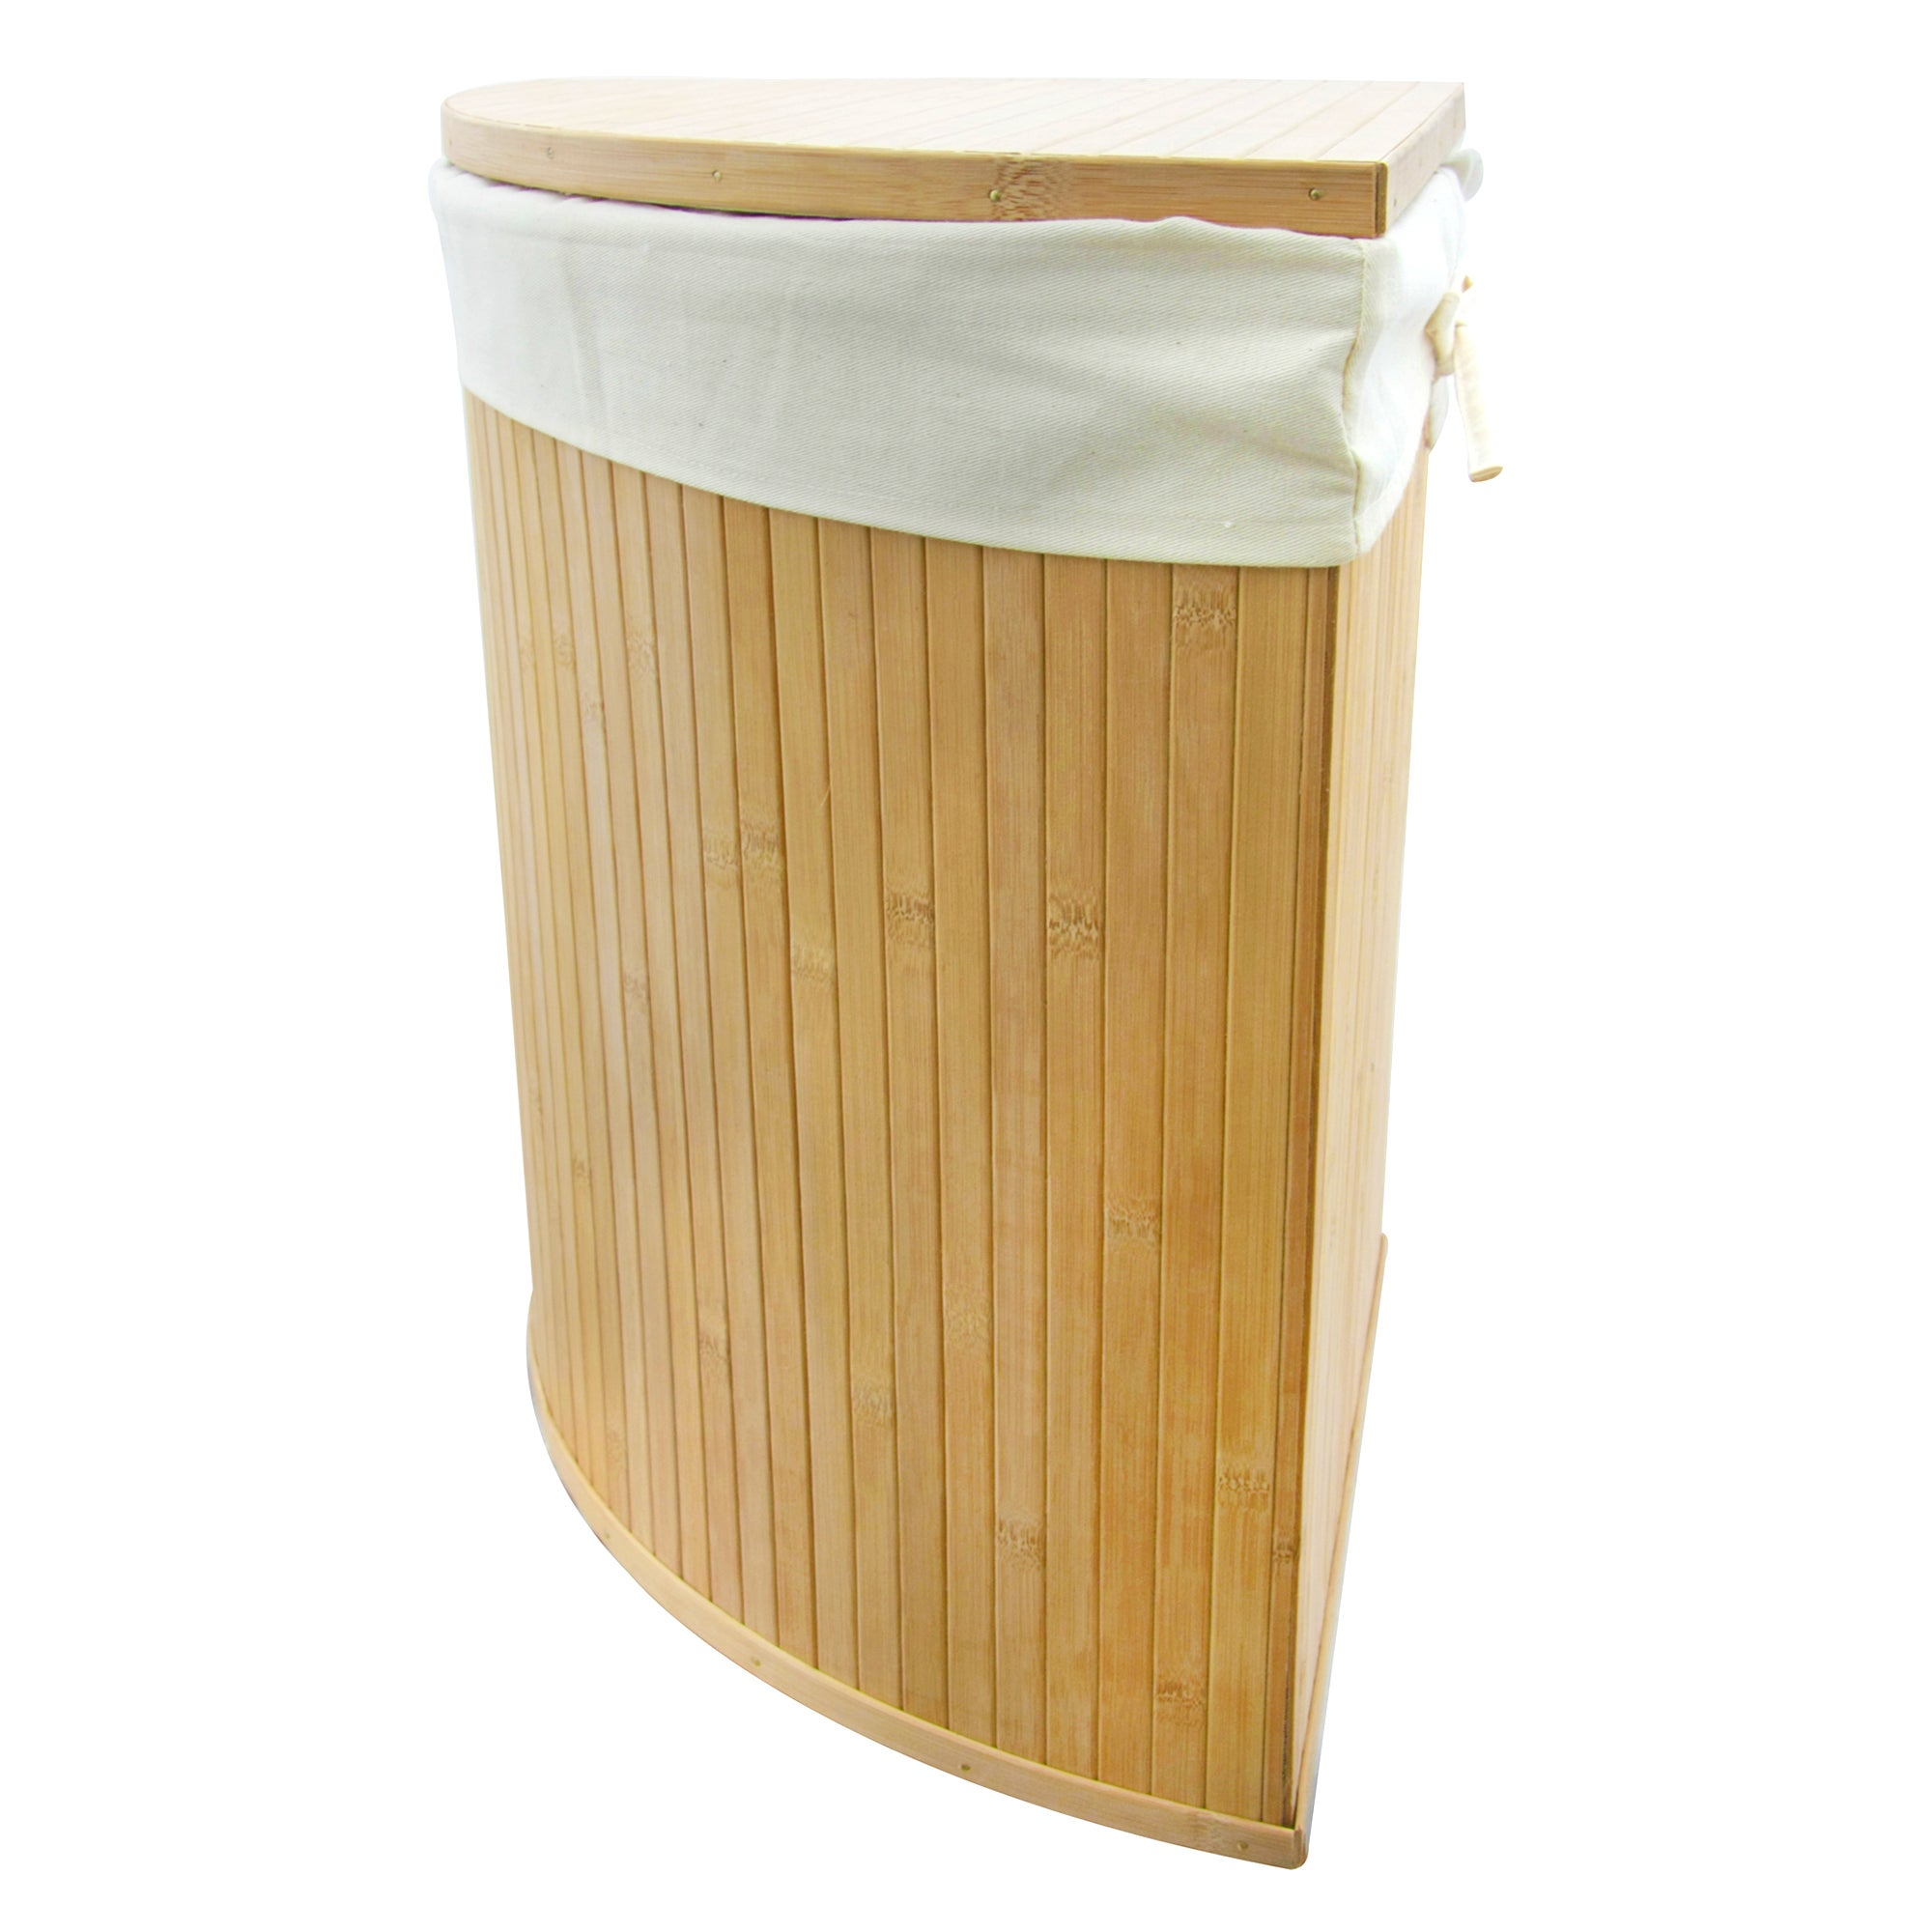 Woodford Corner Bamboo Laundry Hamper